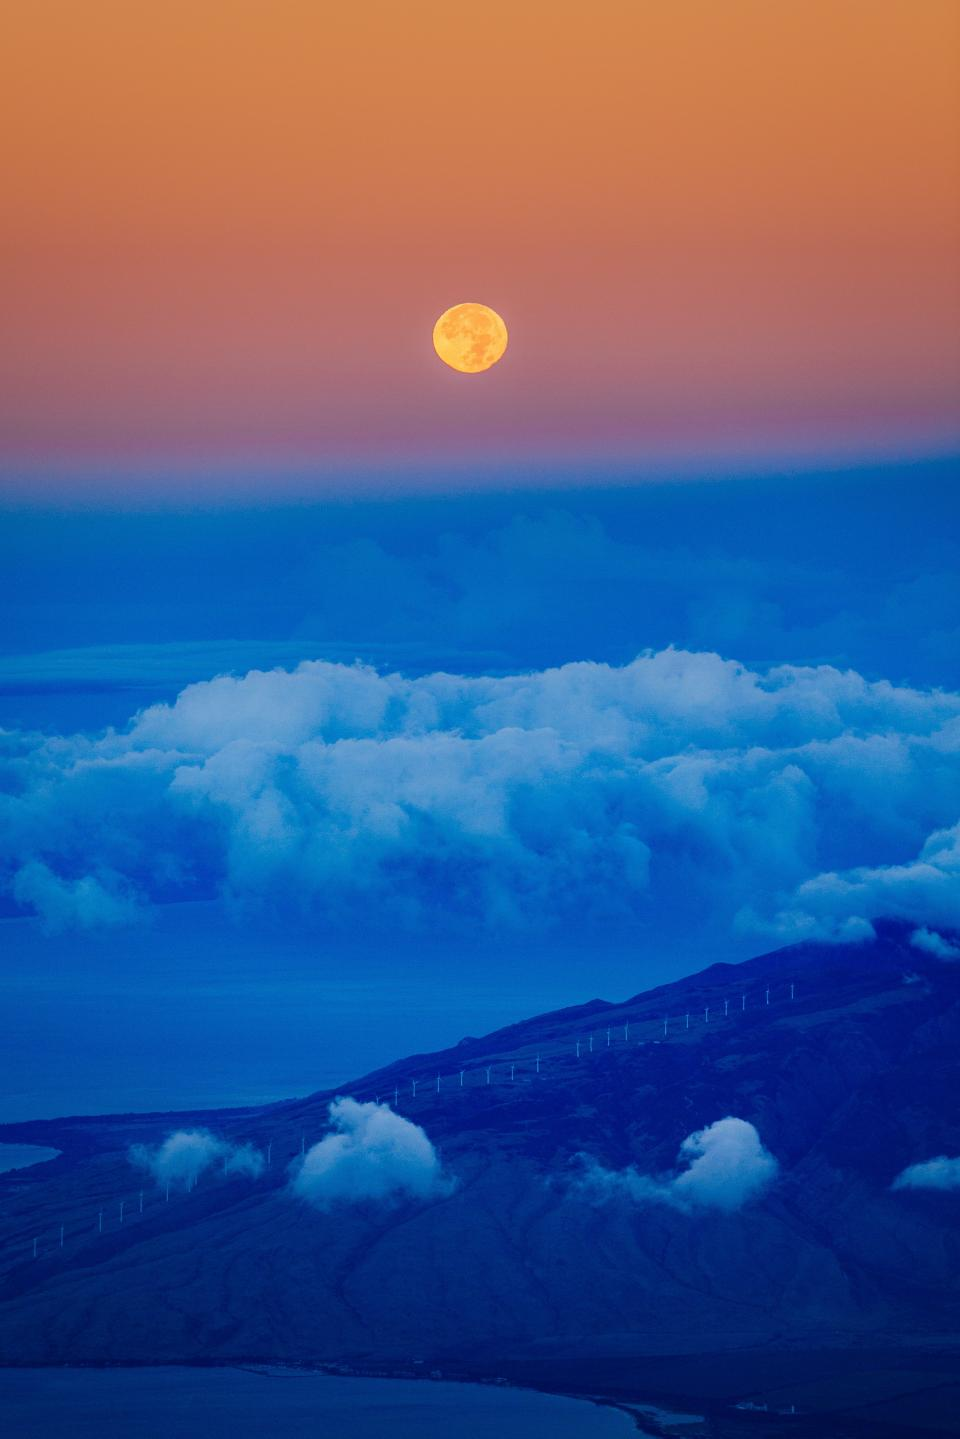 nature, landscape, mountains, summit, peaks, slope, fences, path, roads, coast, shore, water, sea, ocean, sky, horizon, clouds, gradient, moon, blue, orange